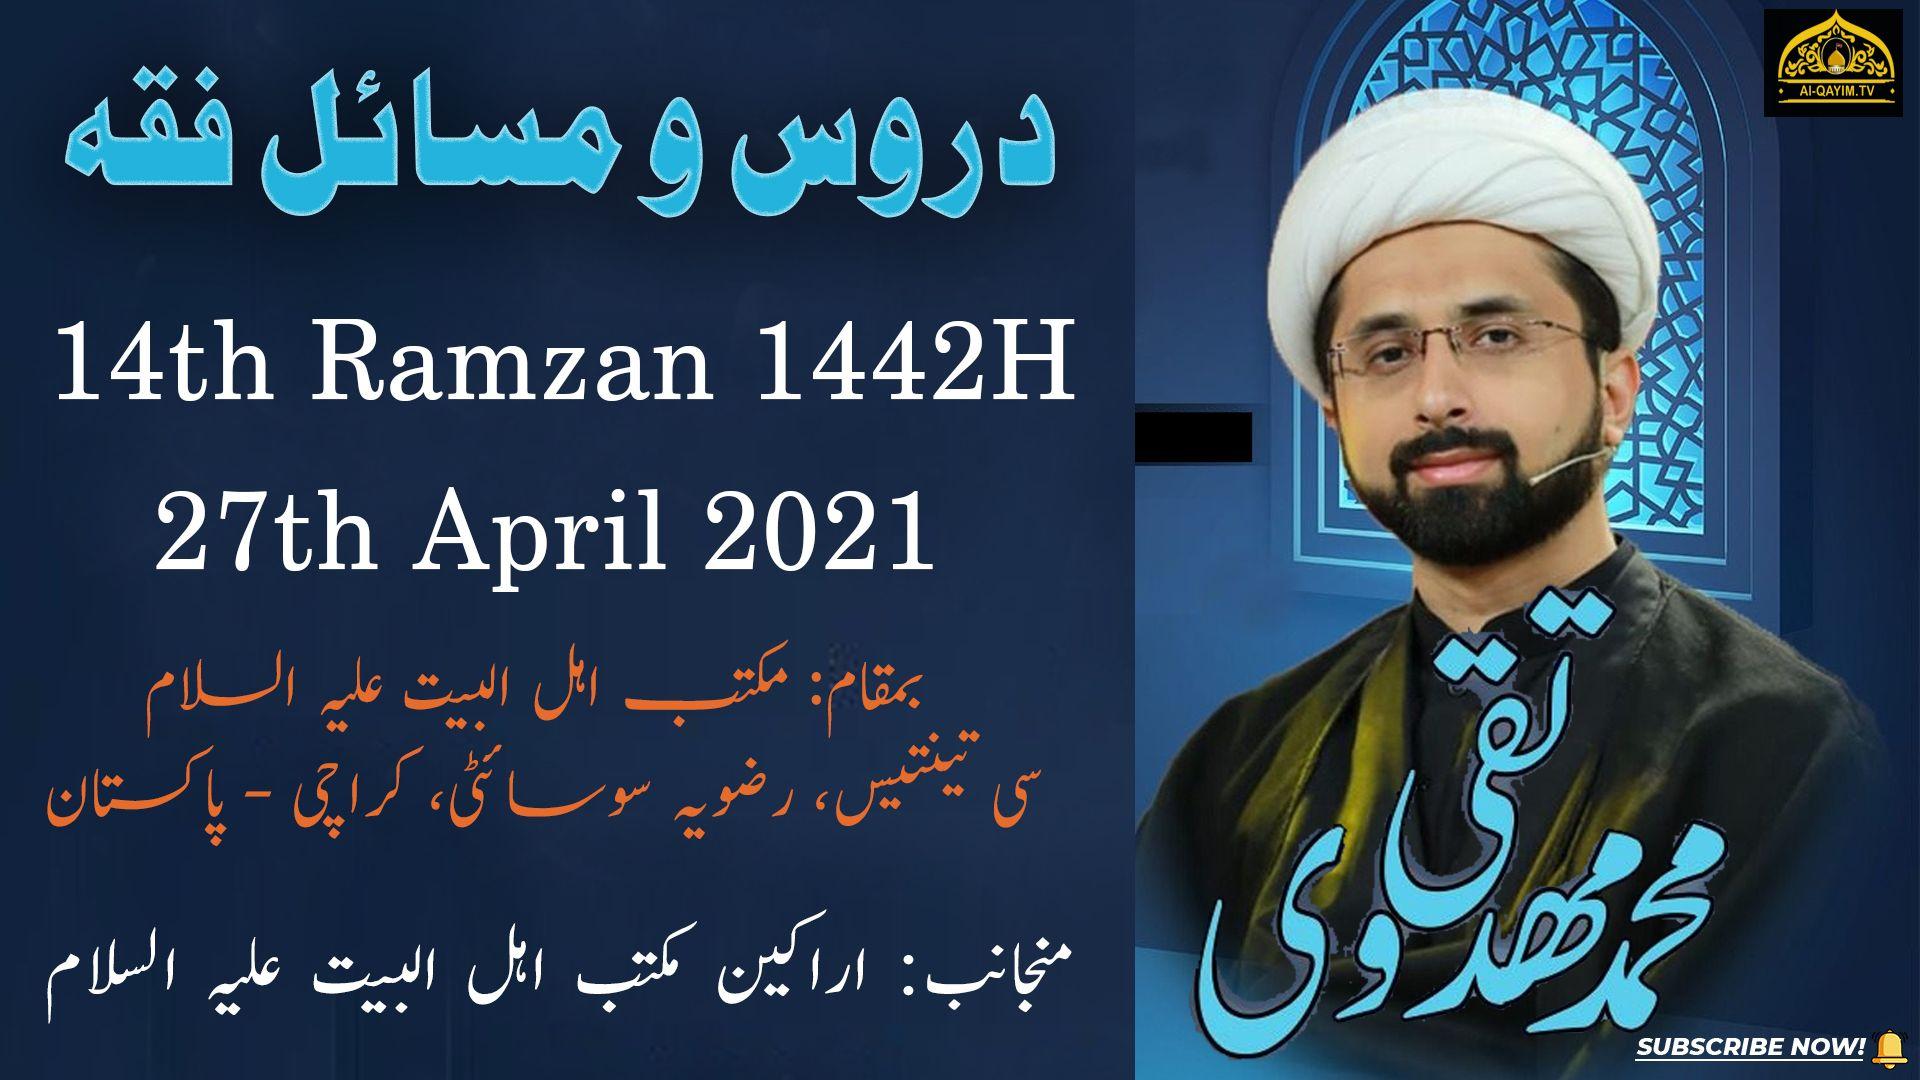 Moulana Muhammad Taqi Mehdavi | Dars Wo Masail Fiqae | 14th Ramzan 2021 | Maktab-e-Ahlebait, Karachi